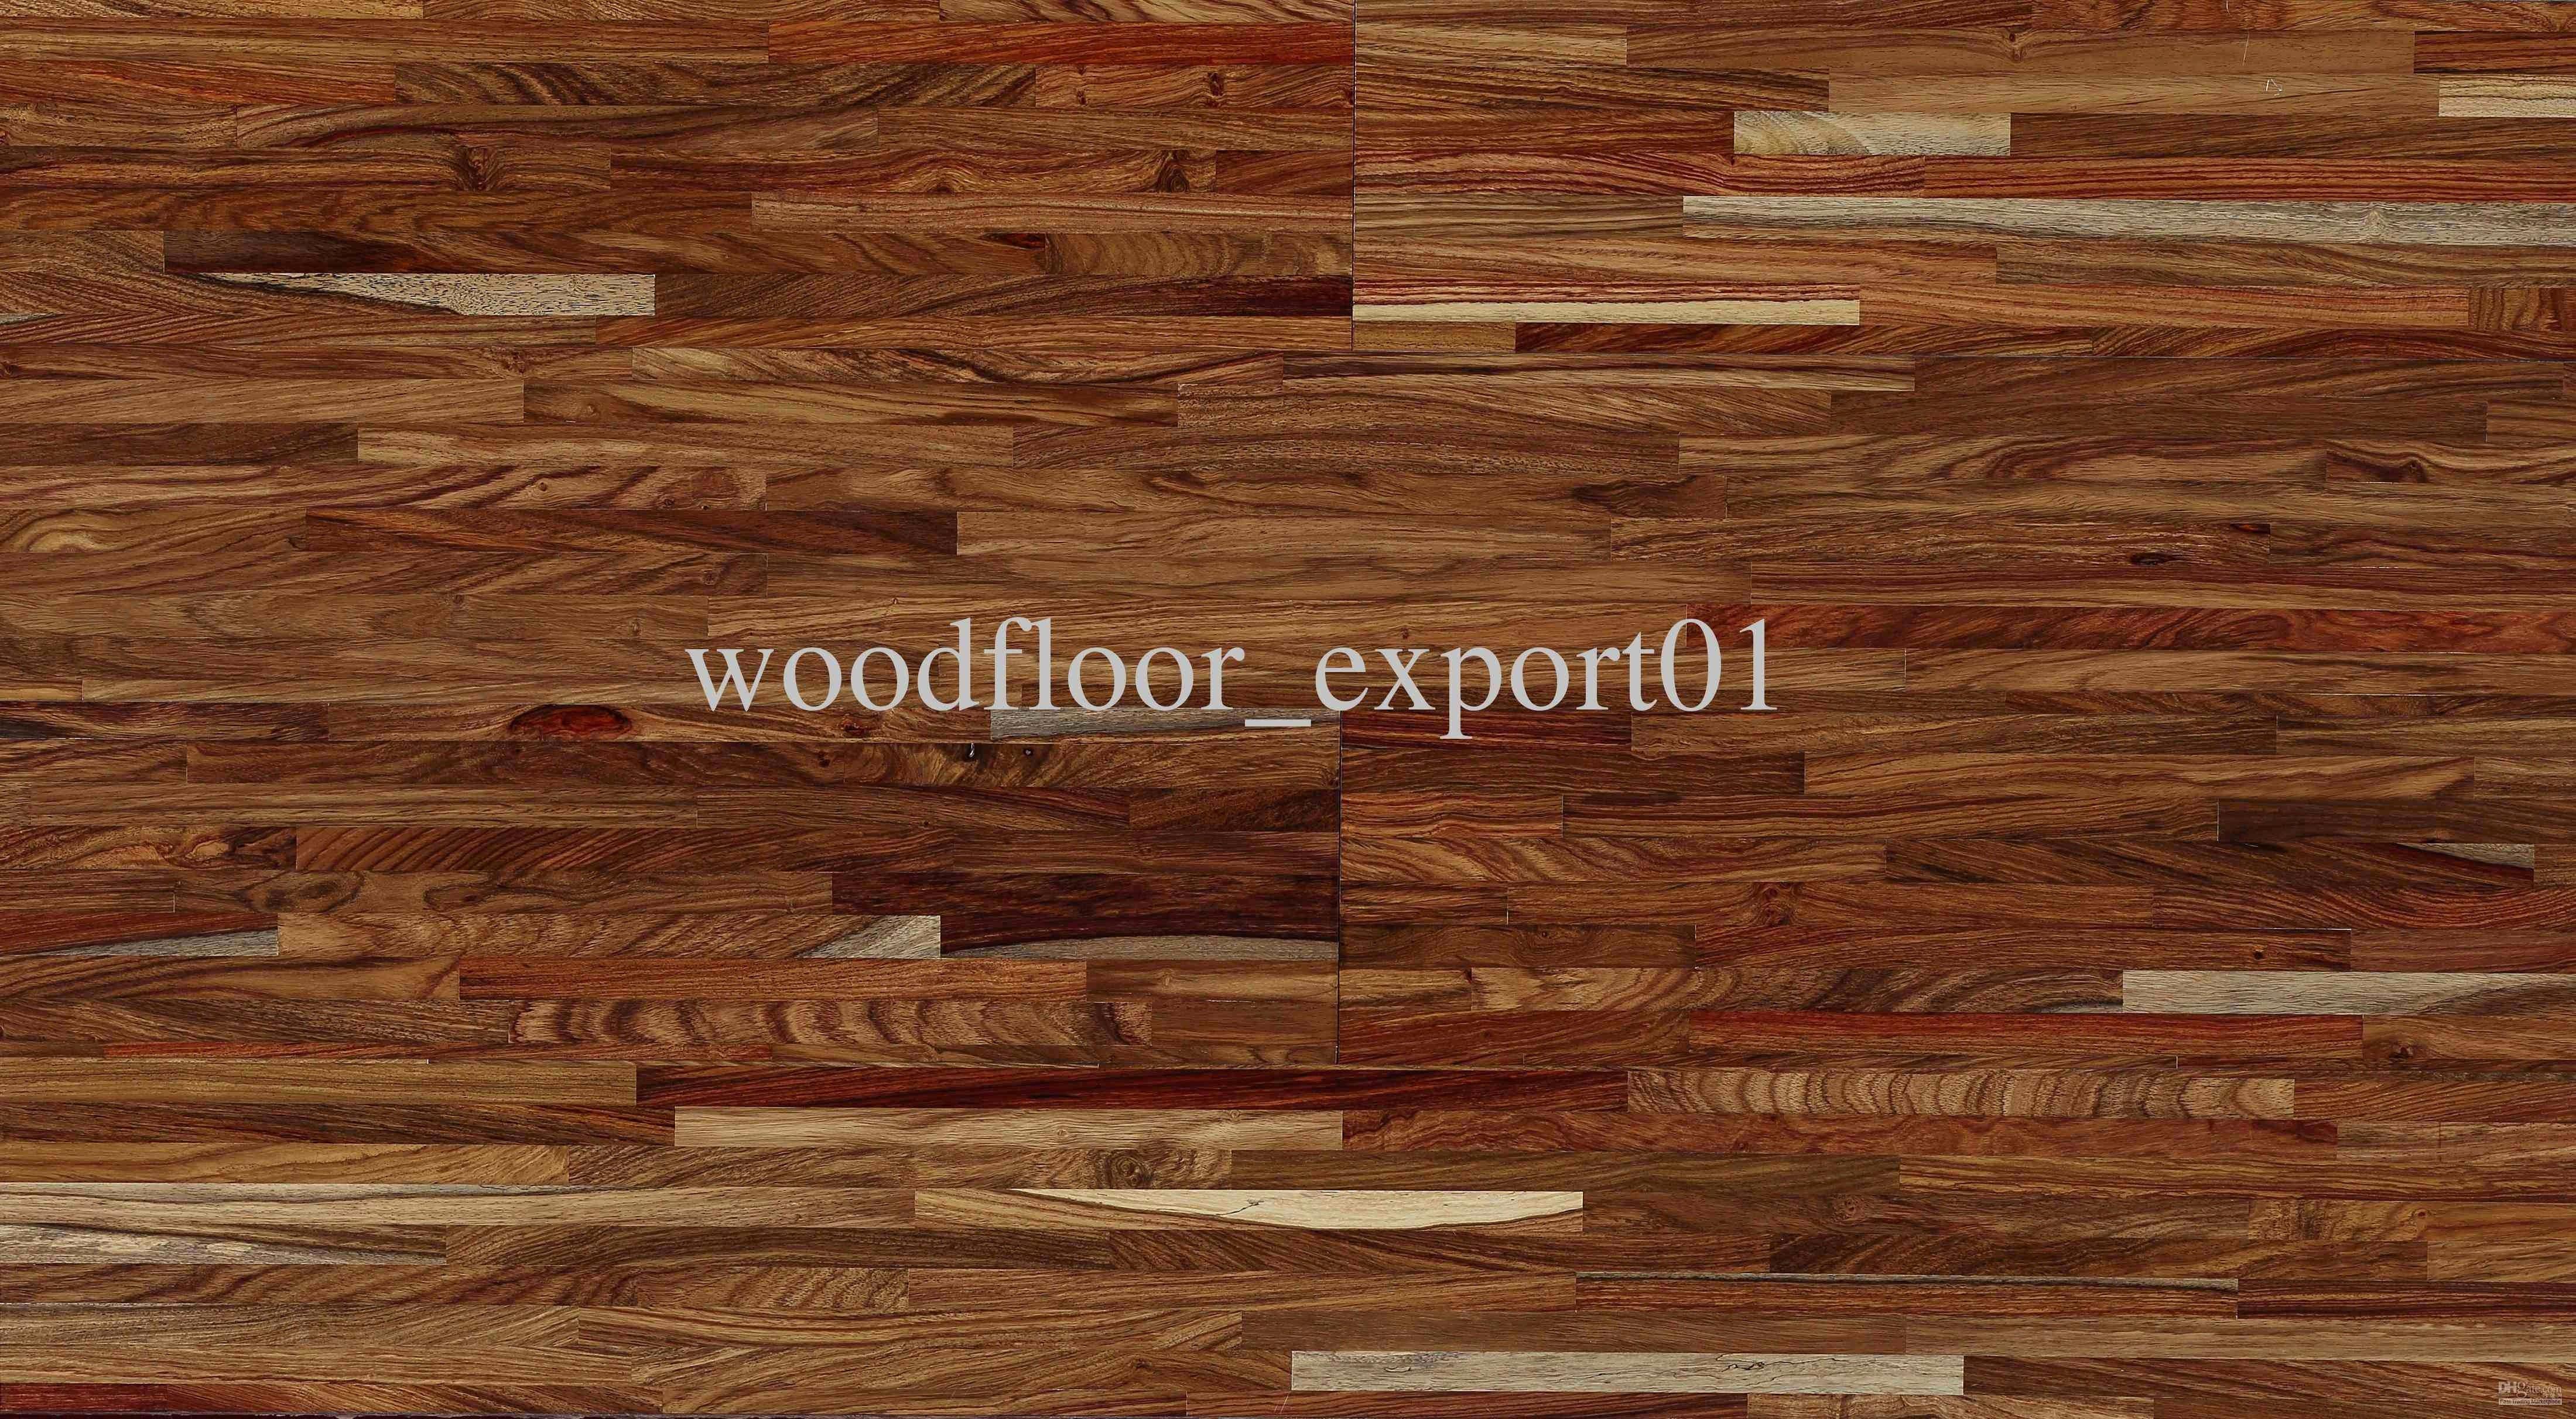 ash hardwood flooring reviews of 19 luxury hardwood refinishing stock dizpos com with regard to hardwood refinishing awesome 50 new restaining hardwood floors 50 s photos of 19 luxury hardwood refinishing